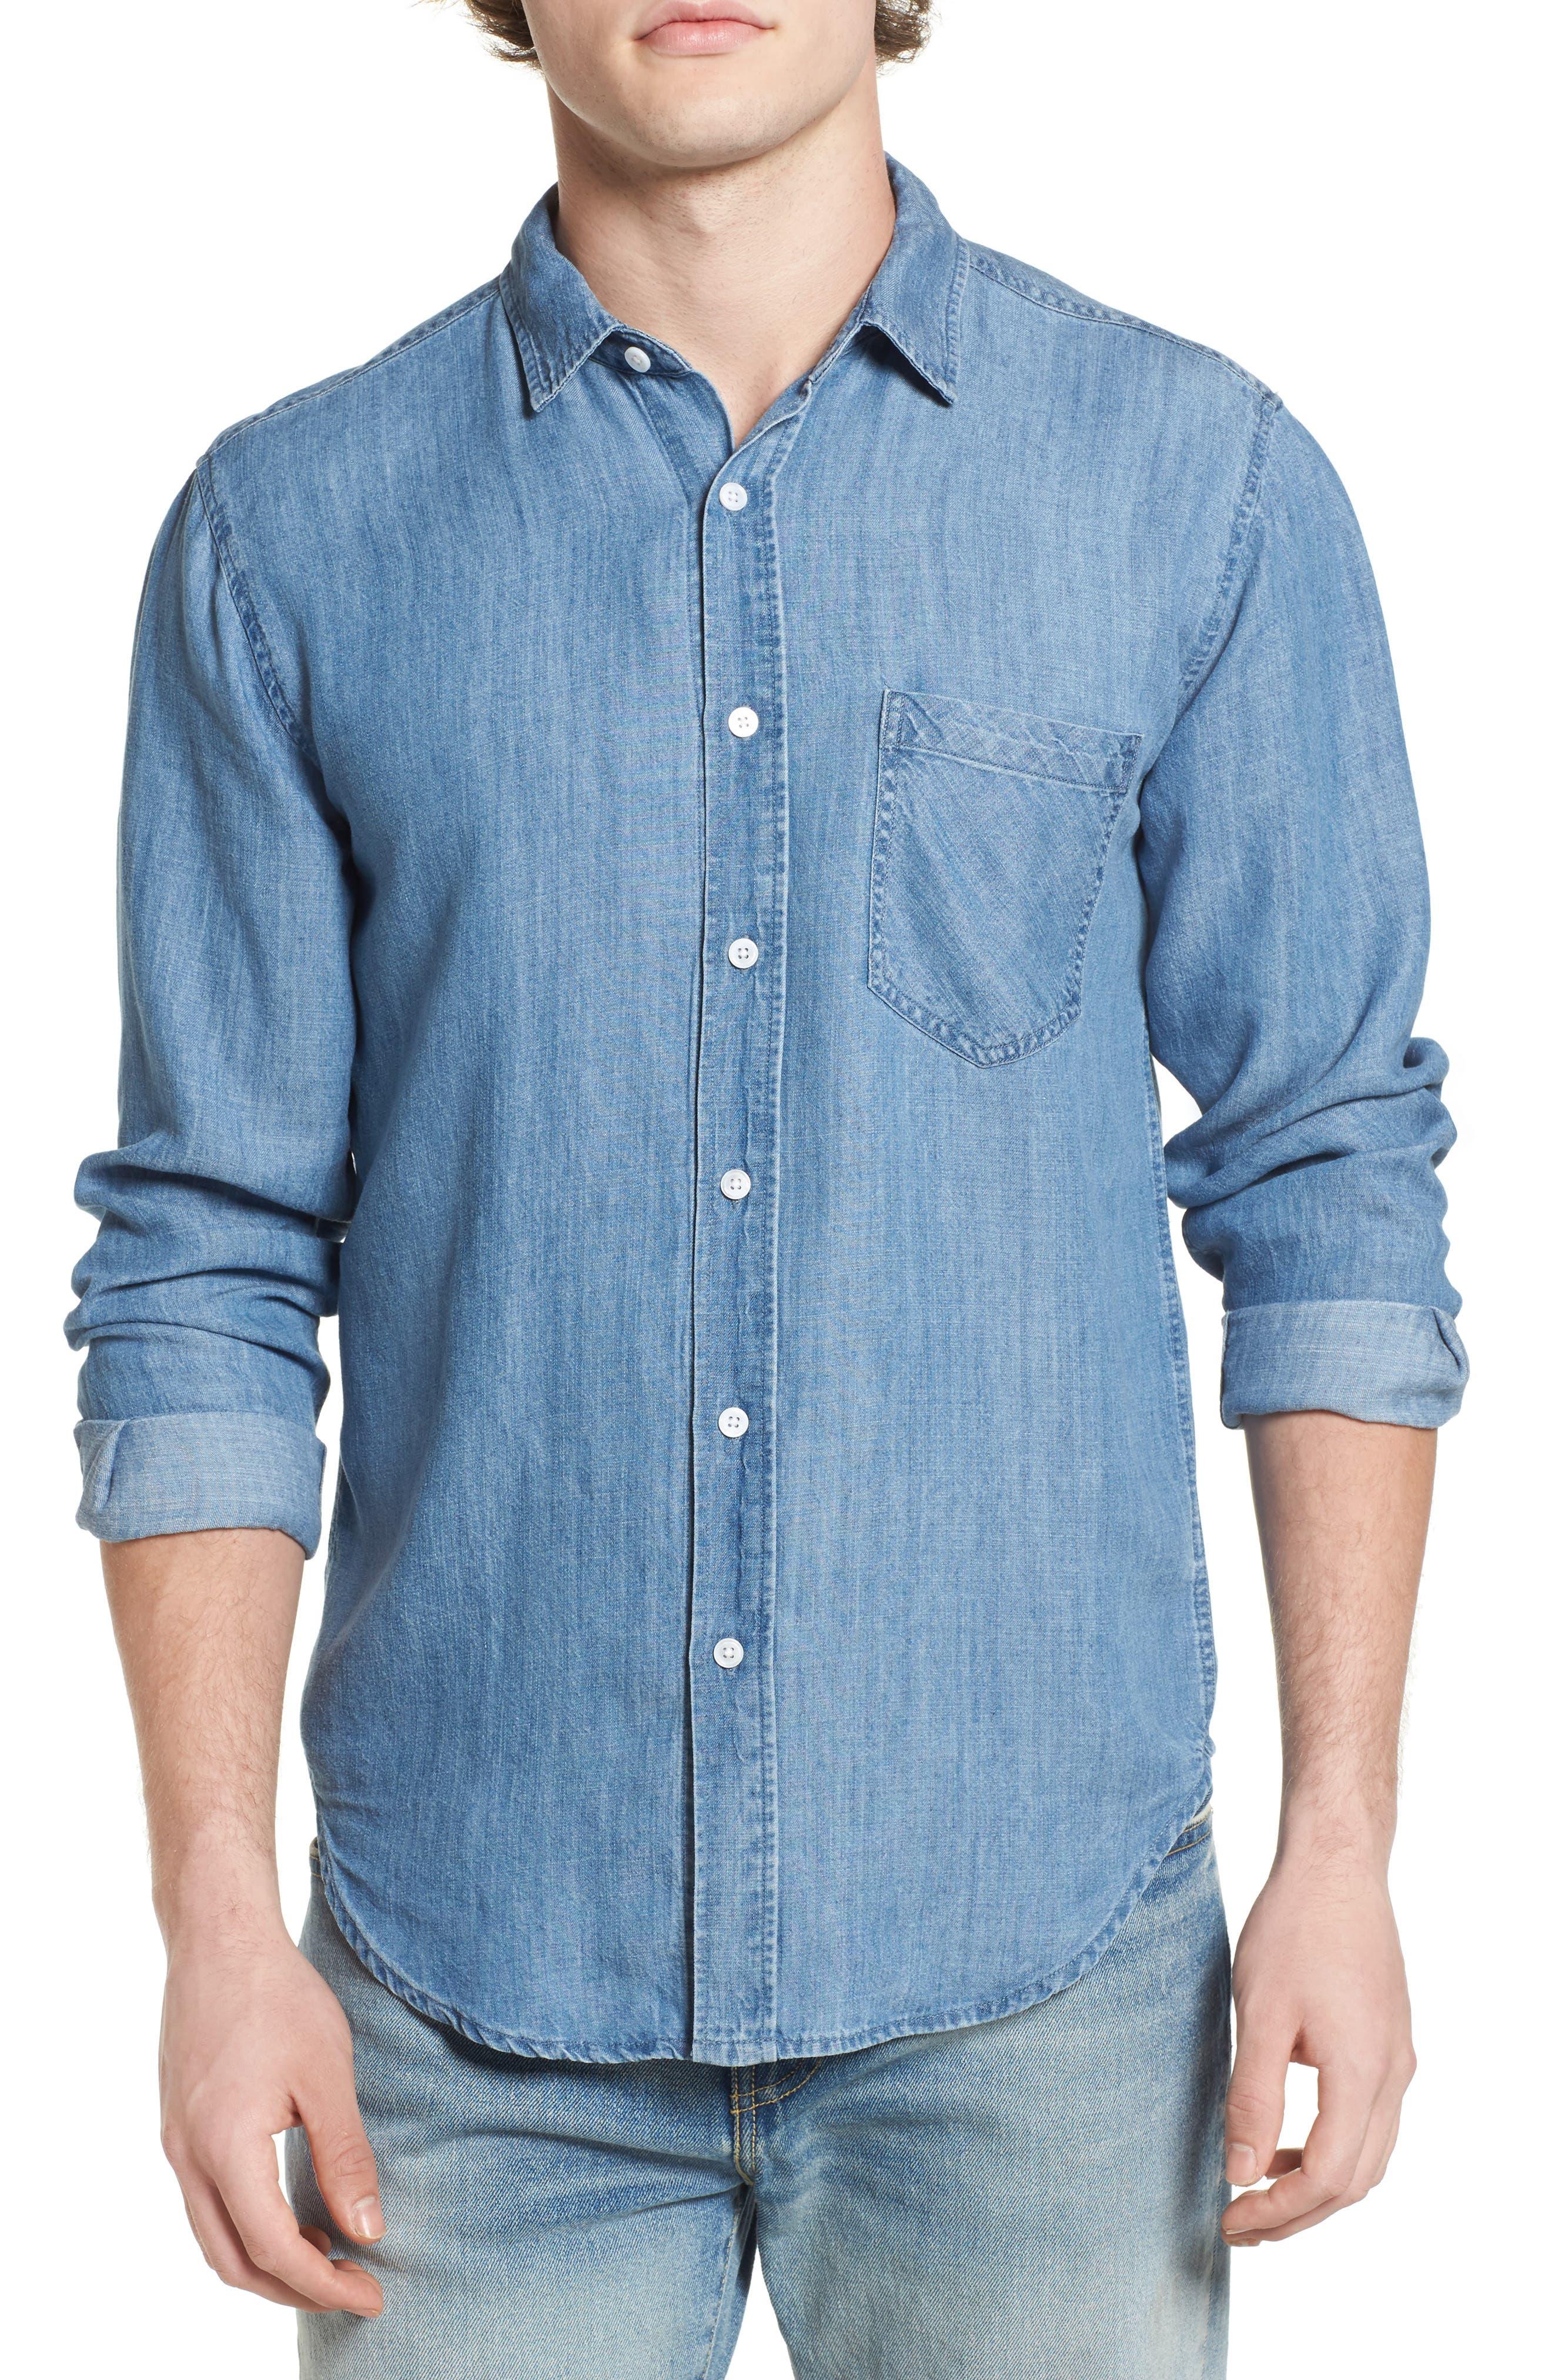 Colton Denim Shirt,                             Main thumbnail 1, color,                             MEDIUM VINTAGE WASH